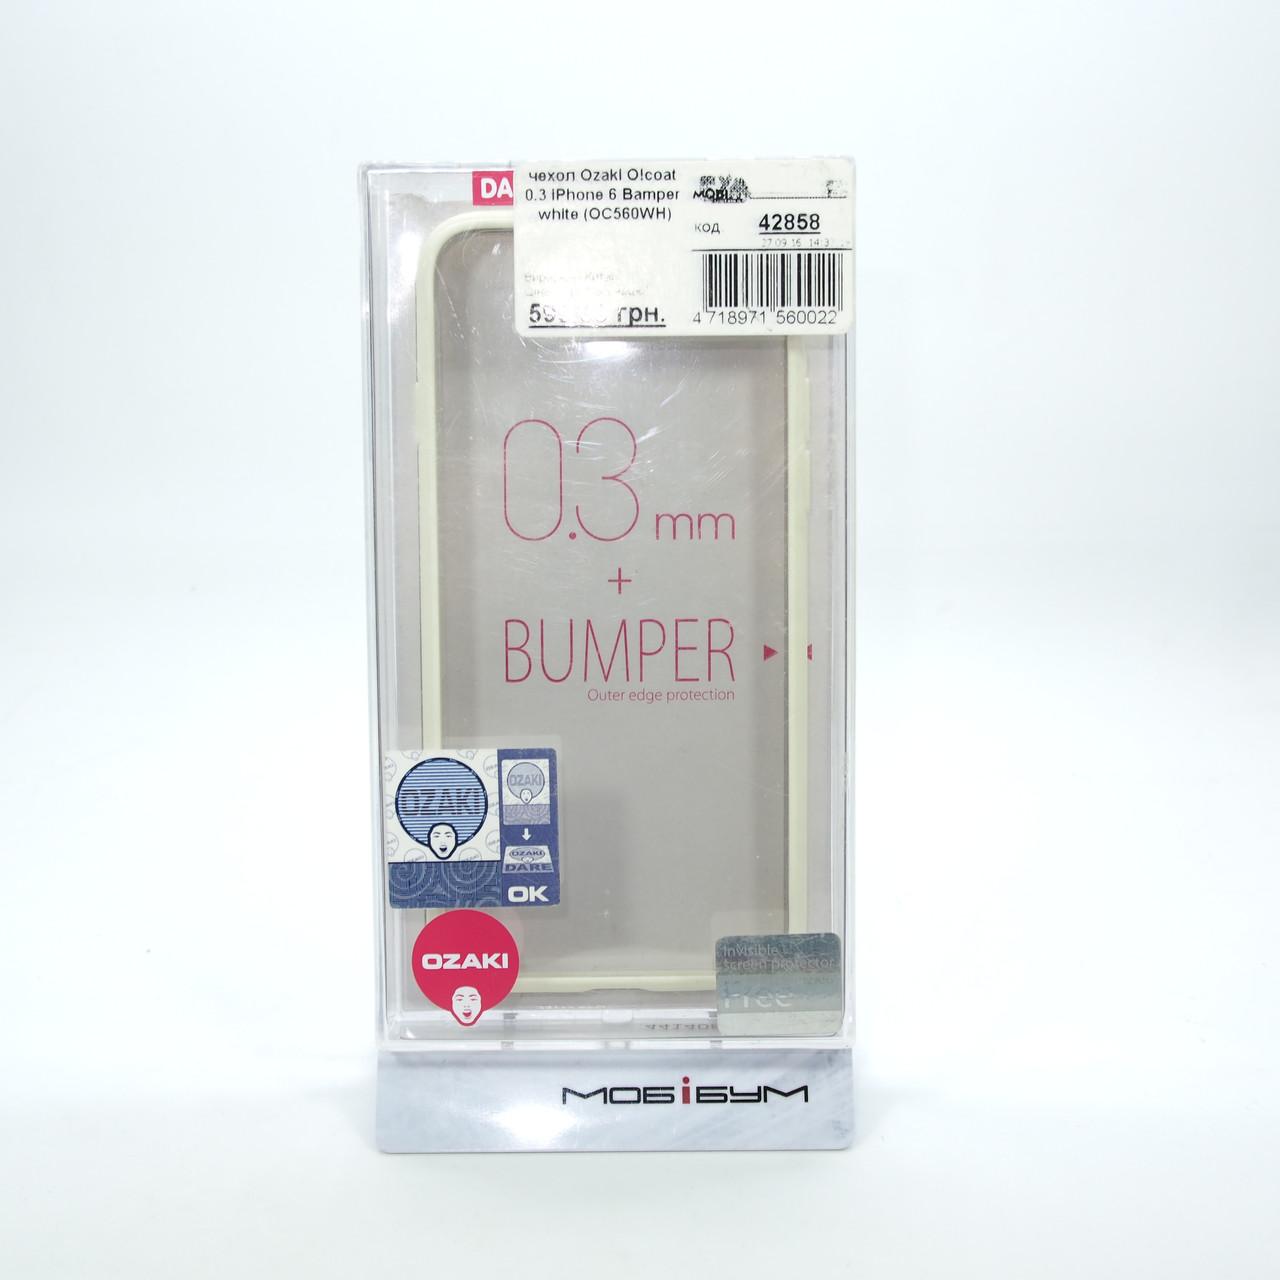 Чохол Ozaki O! Coat 0.3 iPhone 6 Bamper white (OC560WH) EAN / UPC: 4718971560022